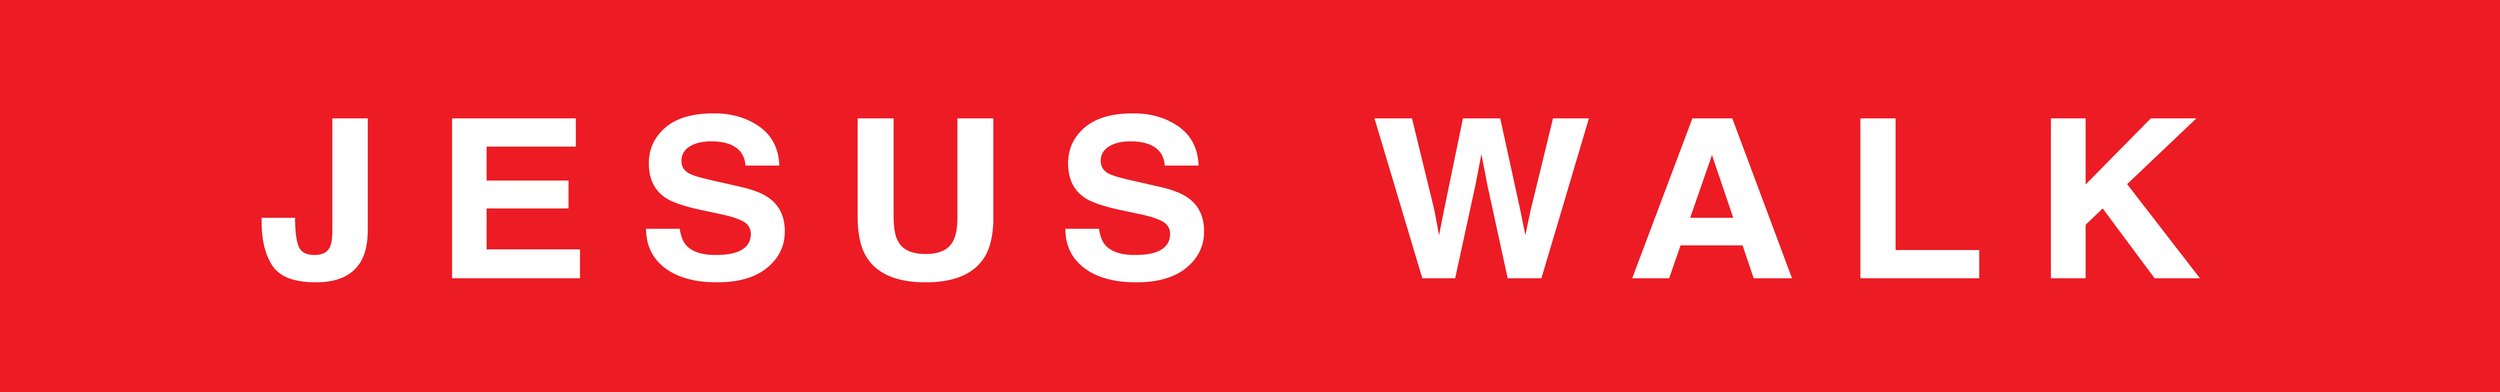 2019 Jesus Walk Designs_Website PNG.png